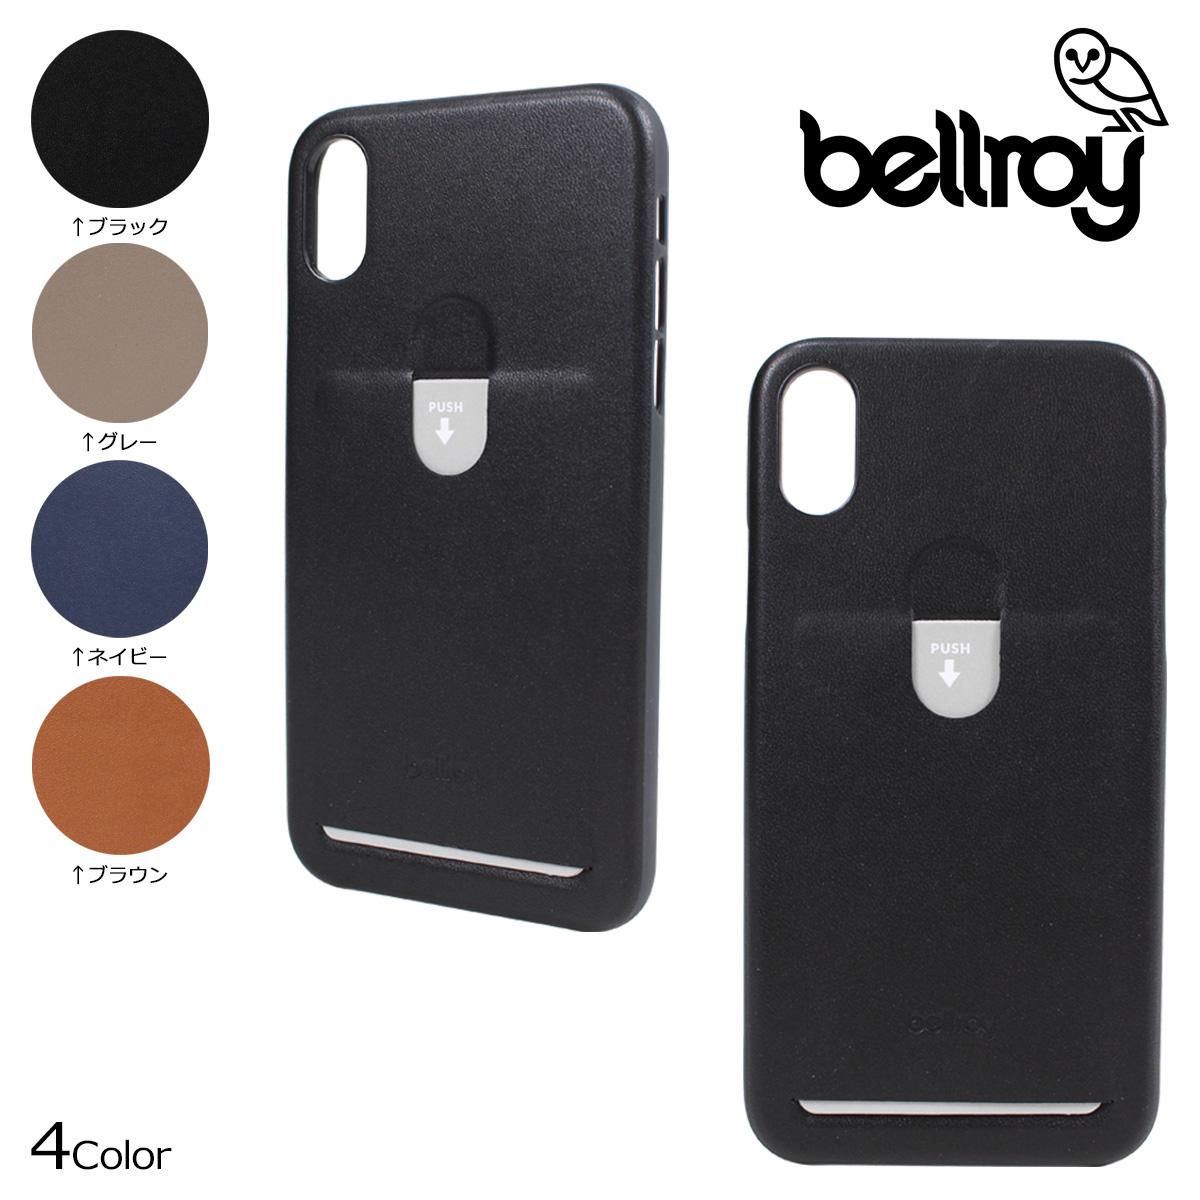 promo code 205b5 5e014 Bellroy bell Roy iPhoneX case smartphone eyephone PHONE CASE 1 CARD men gap  Dis PCXA [5/1 Shinnyu load]